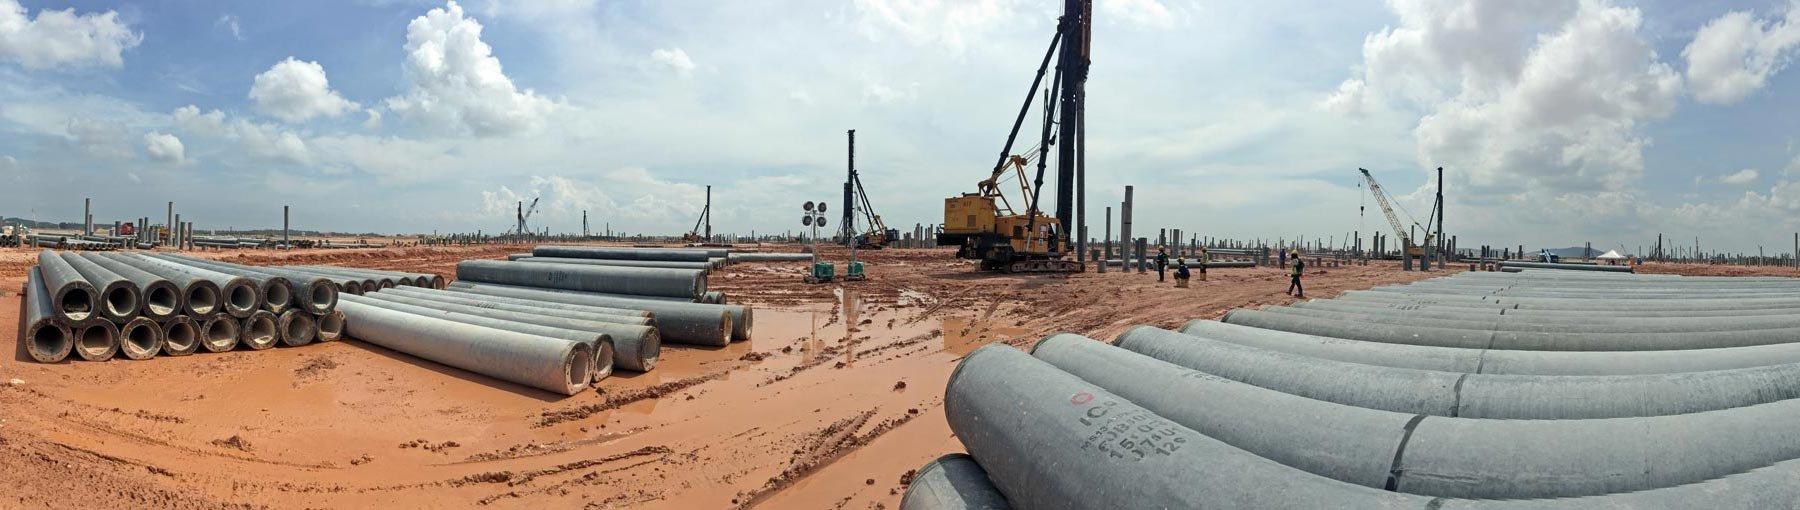 FOT. 1. Instalacja pali typu Spun Piles – projekt Rapid, Malezja